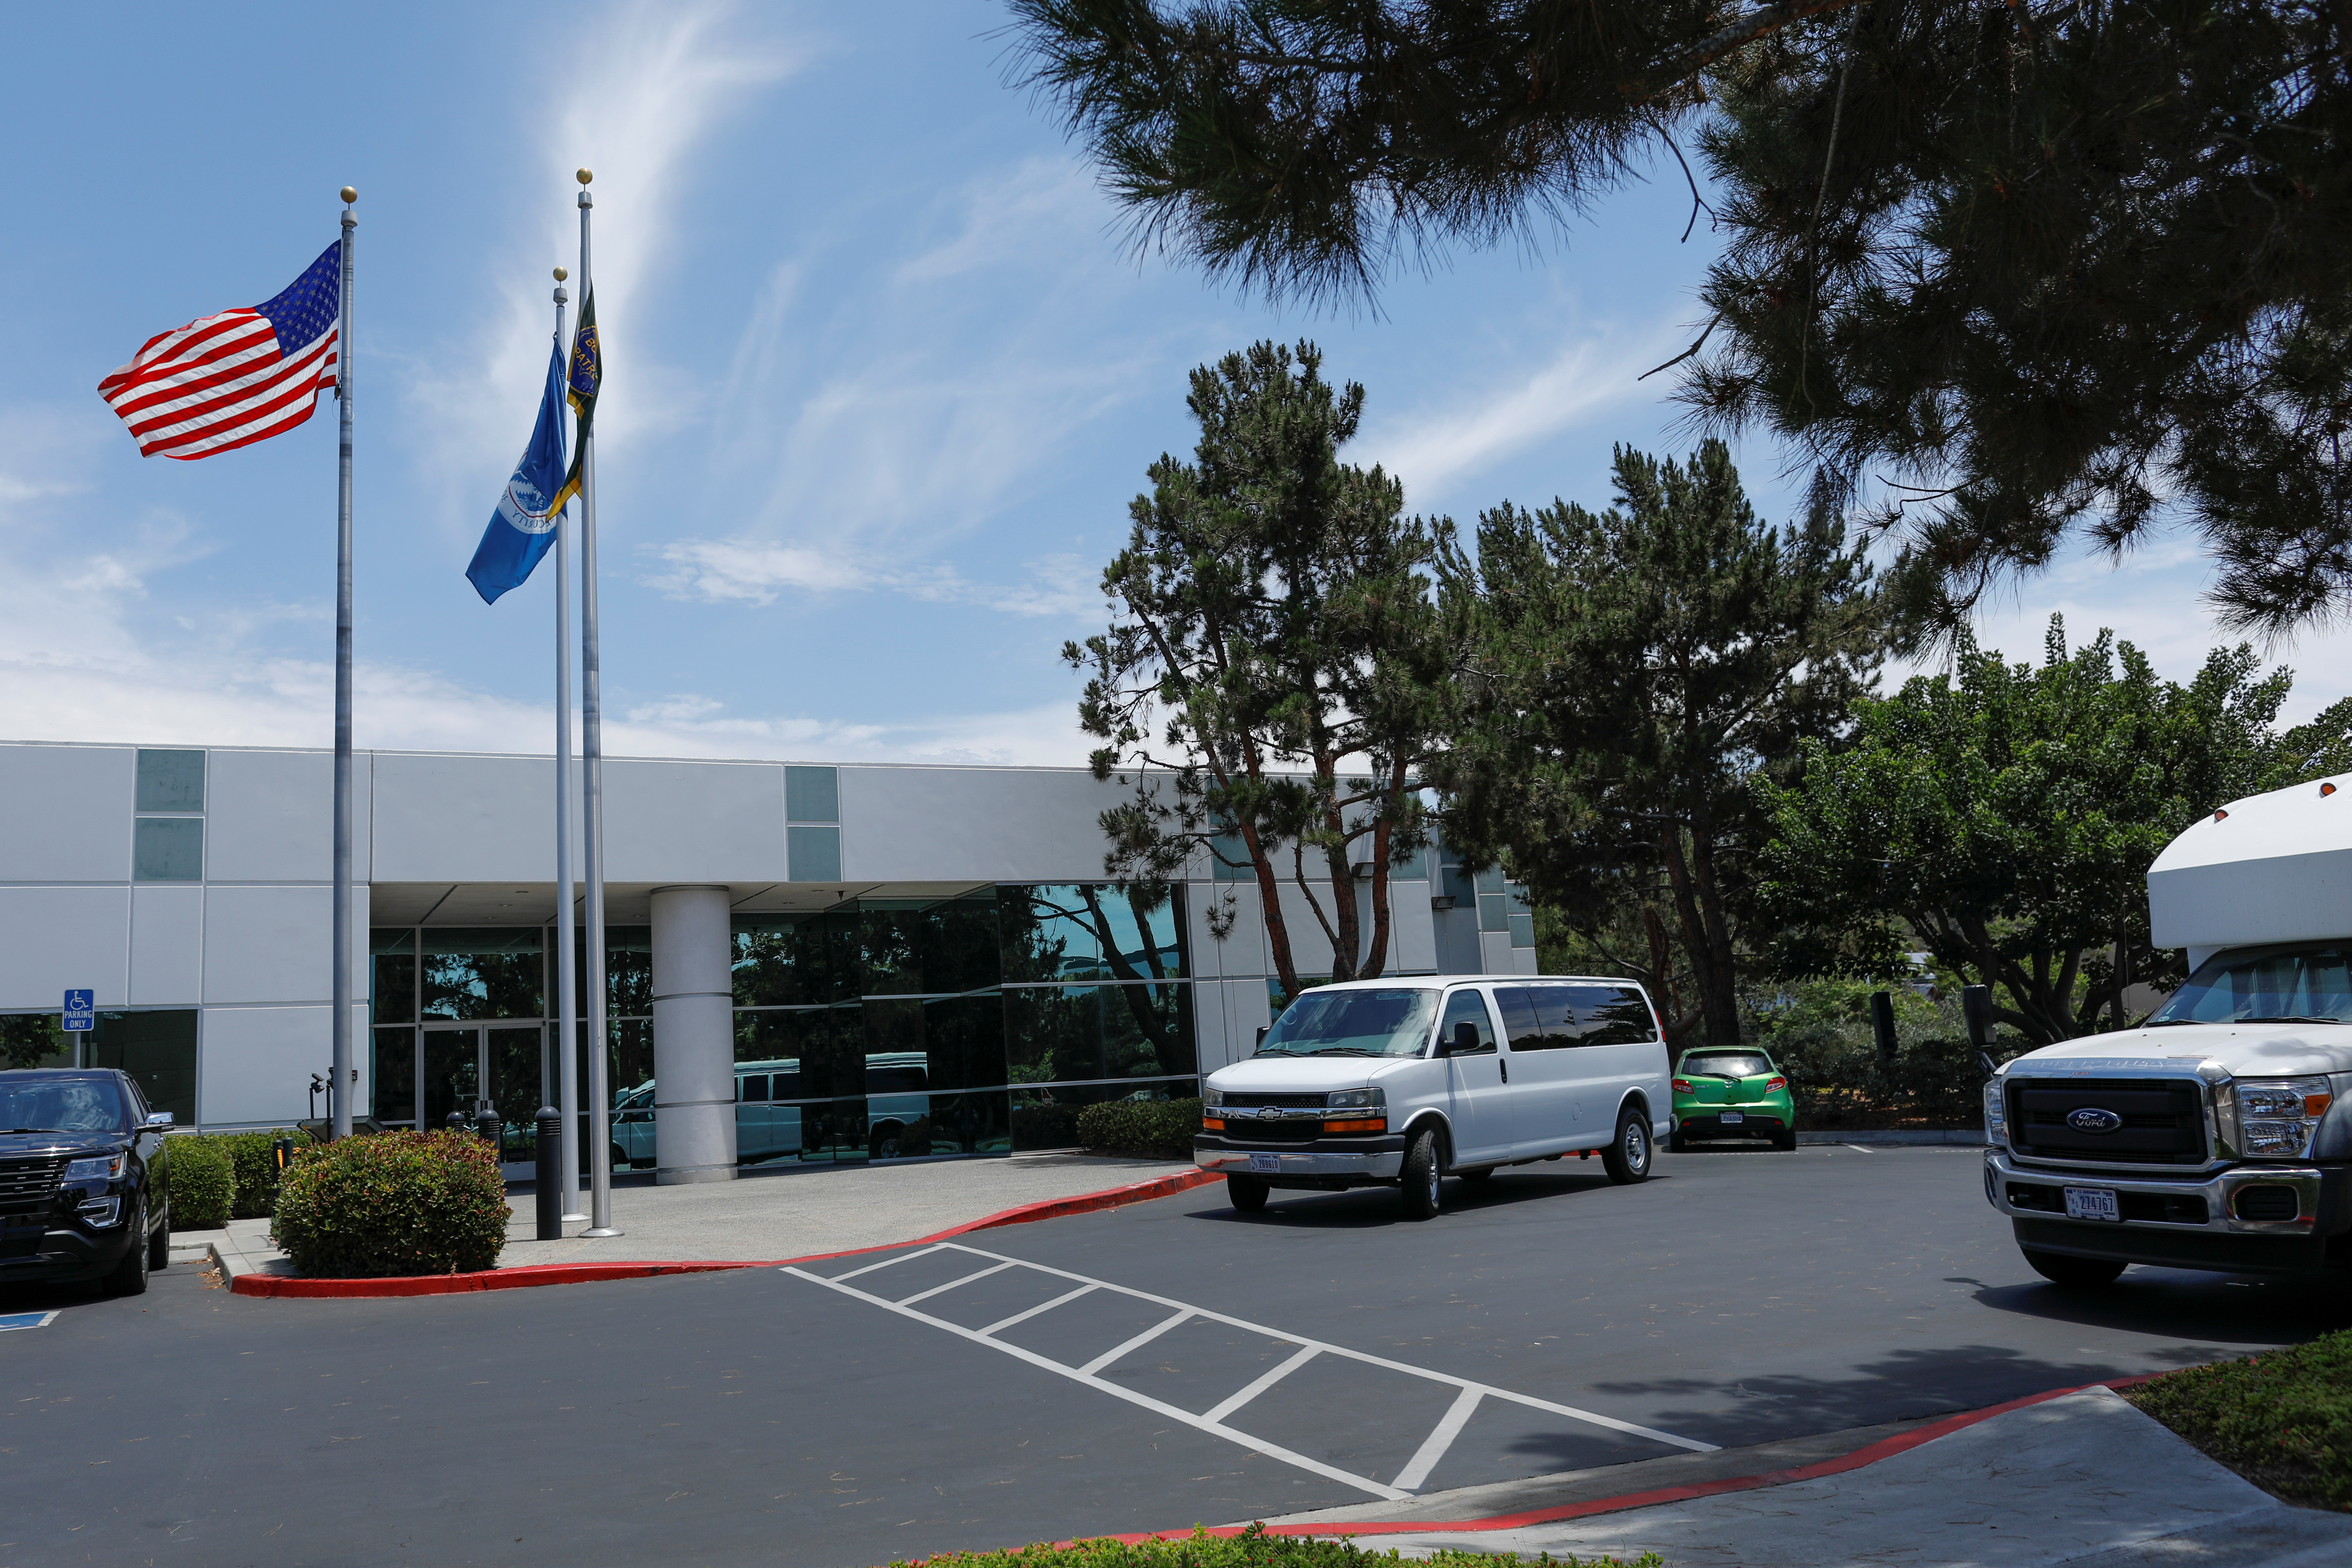 A Customs and Border Patrol facility is shown in Chula Vista, California